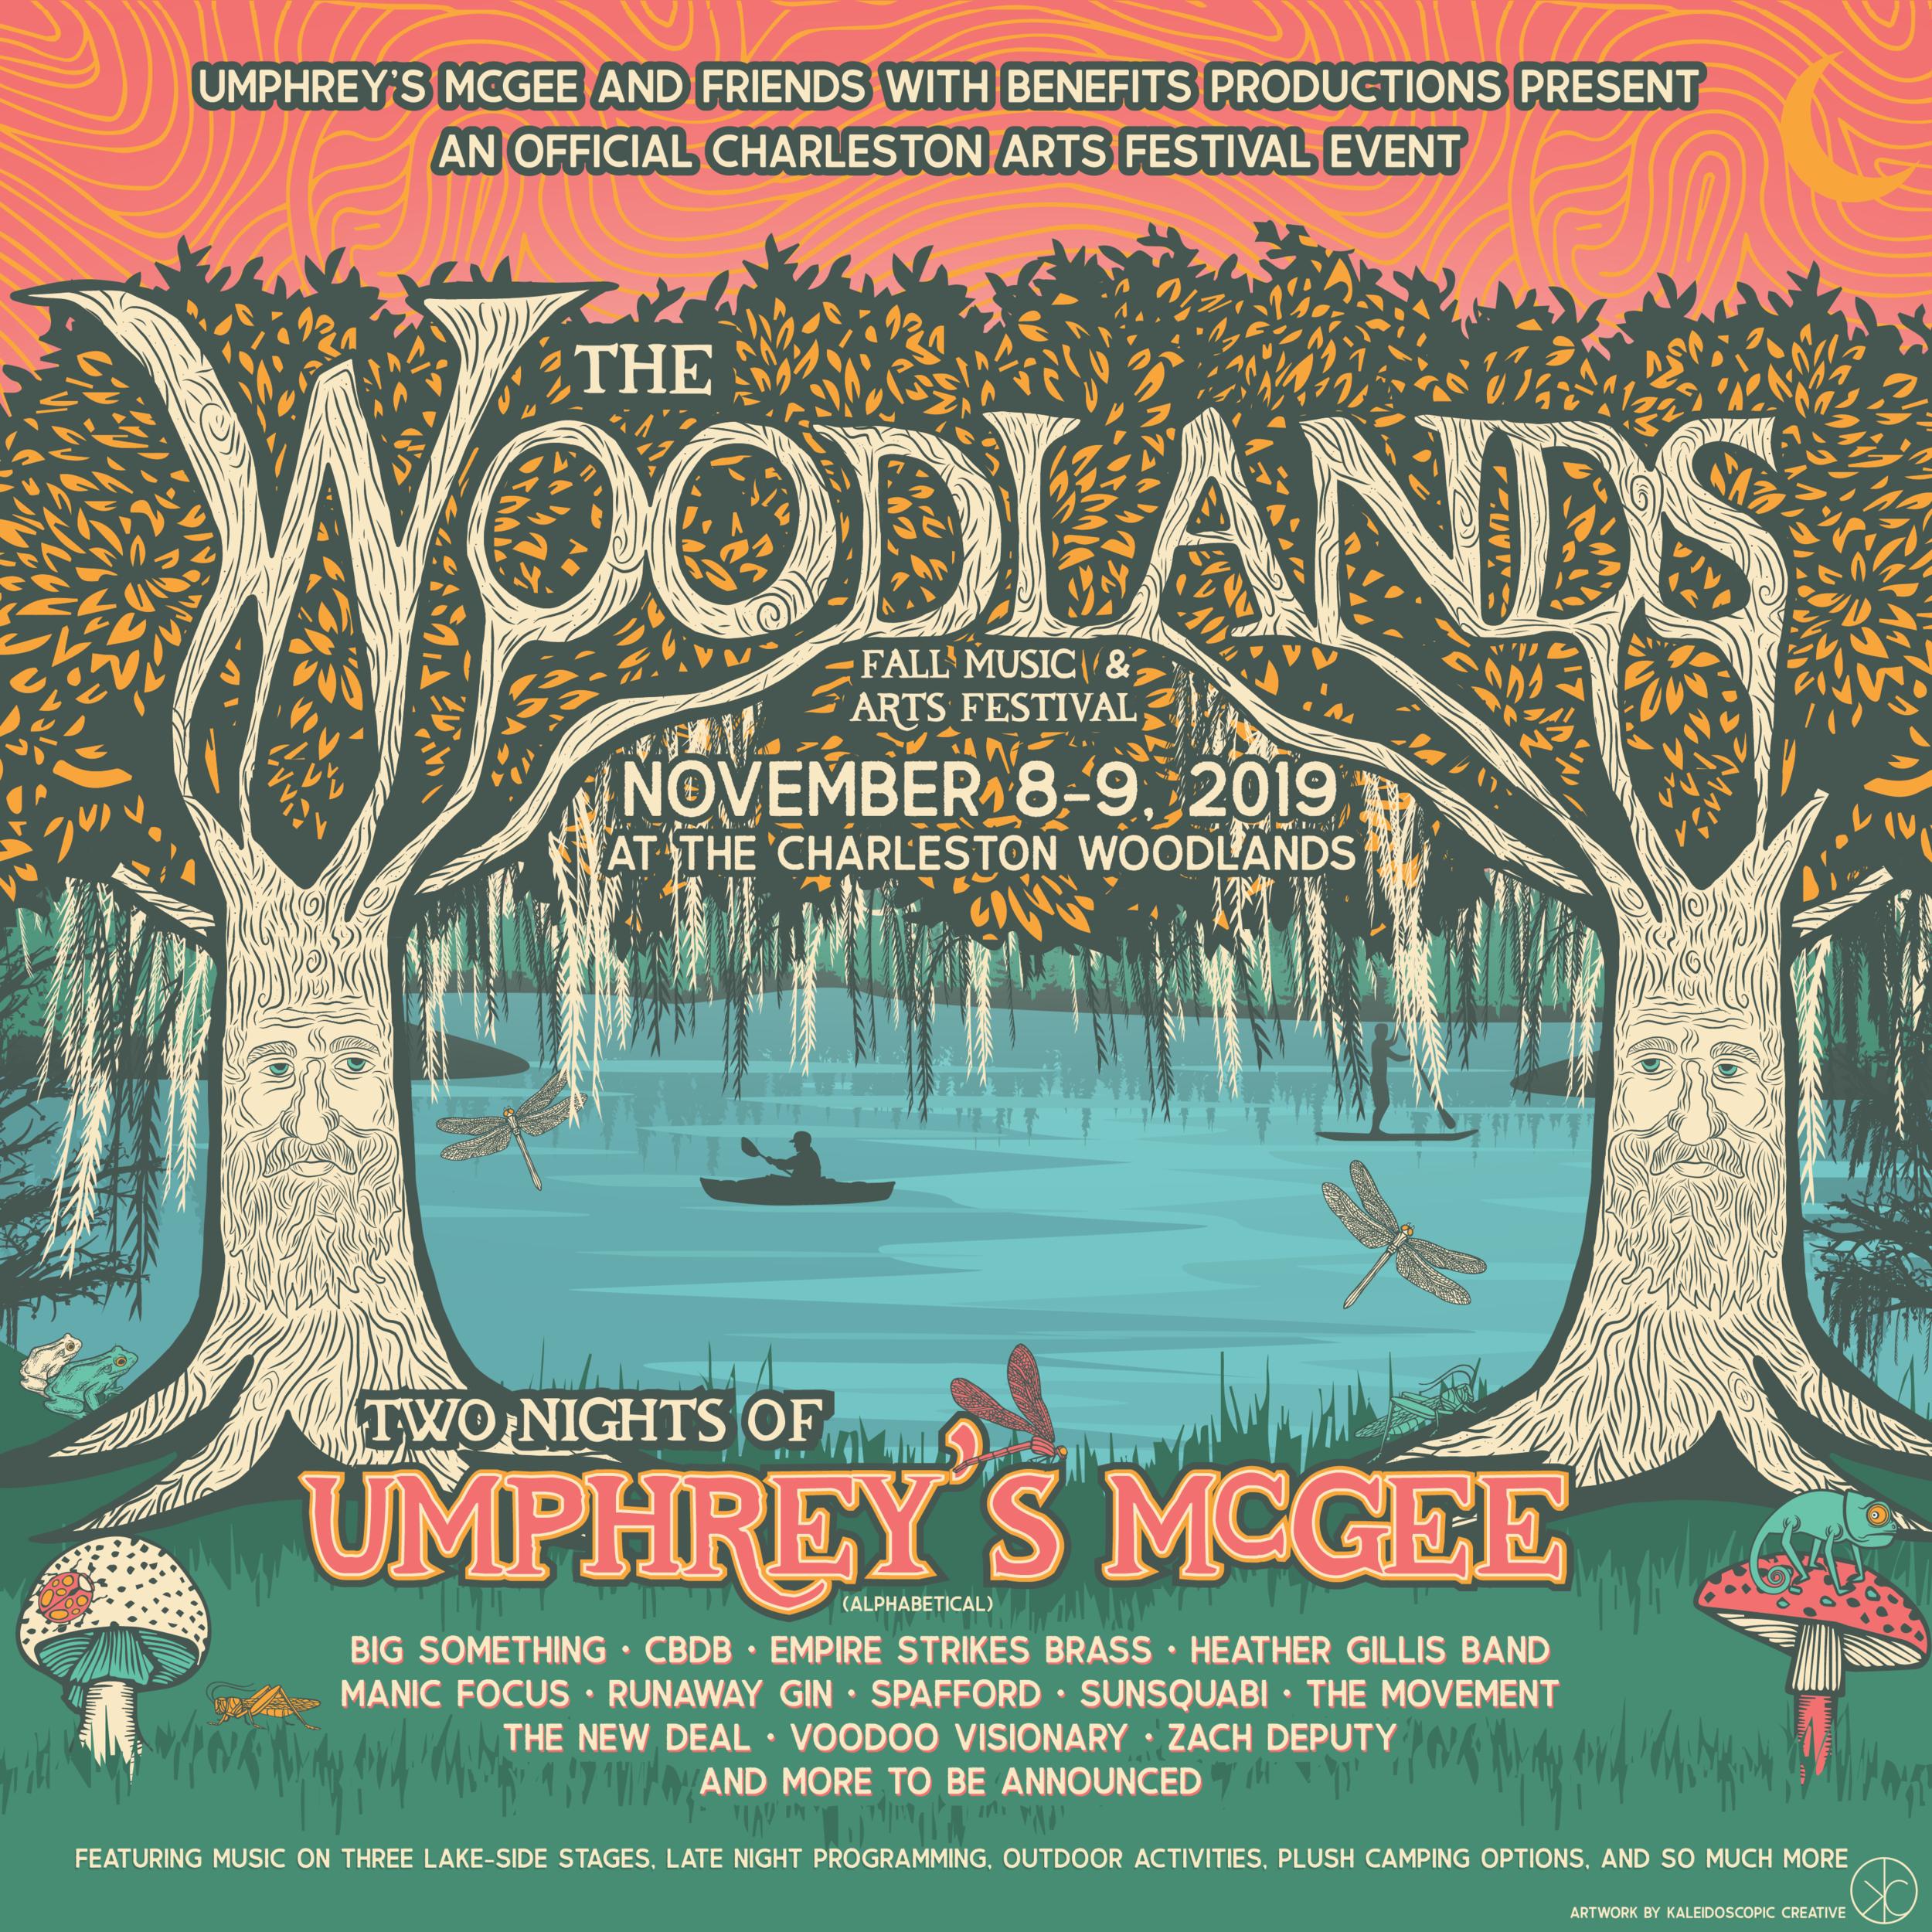 woodlands-square-01.png